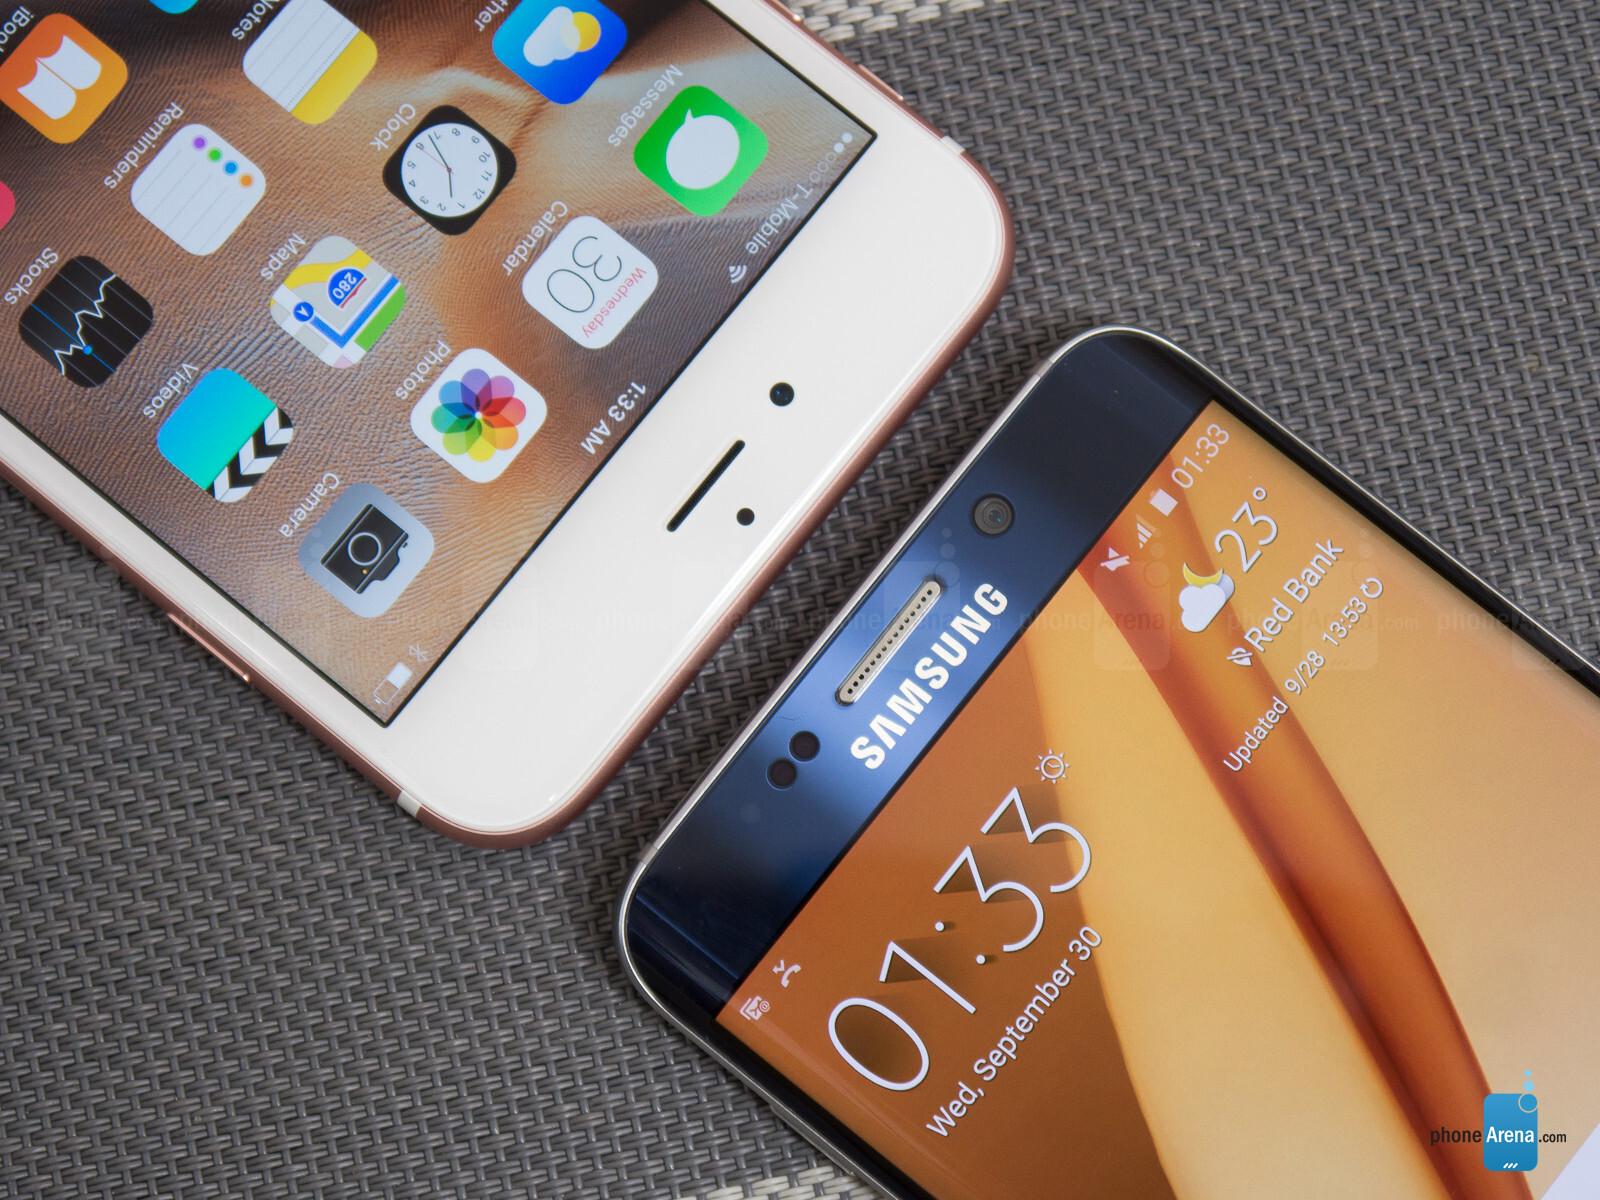 Iphone 6 plus galaxy s6 edge